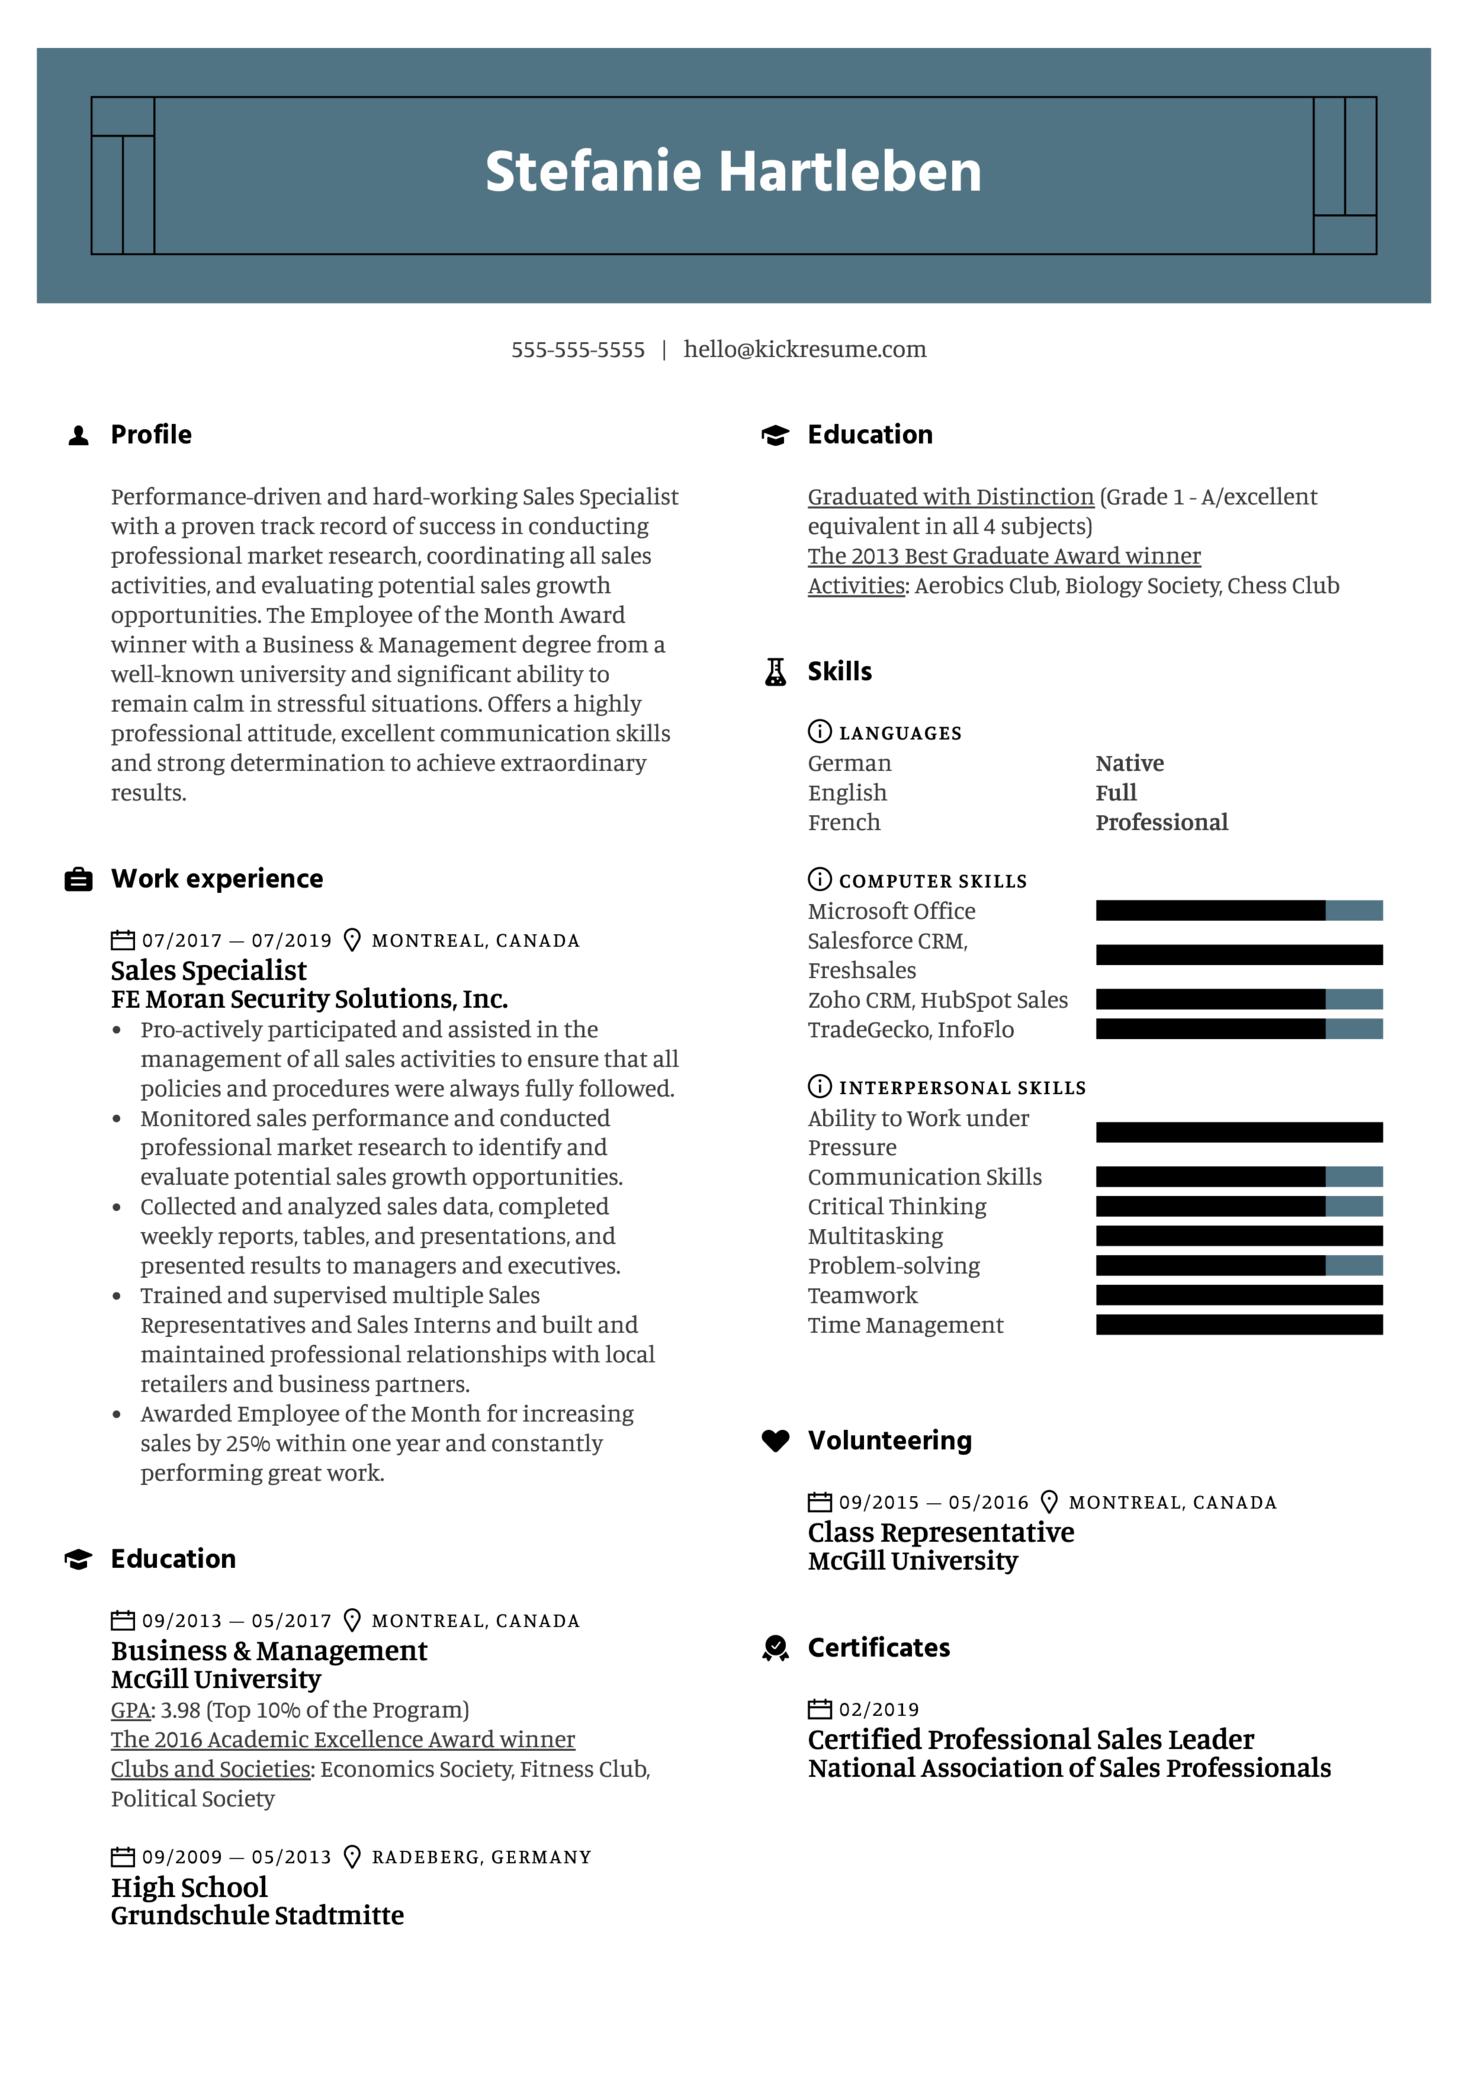 Sales Specialist Resume Example (Part 1)